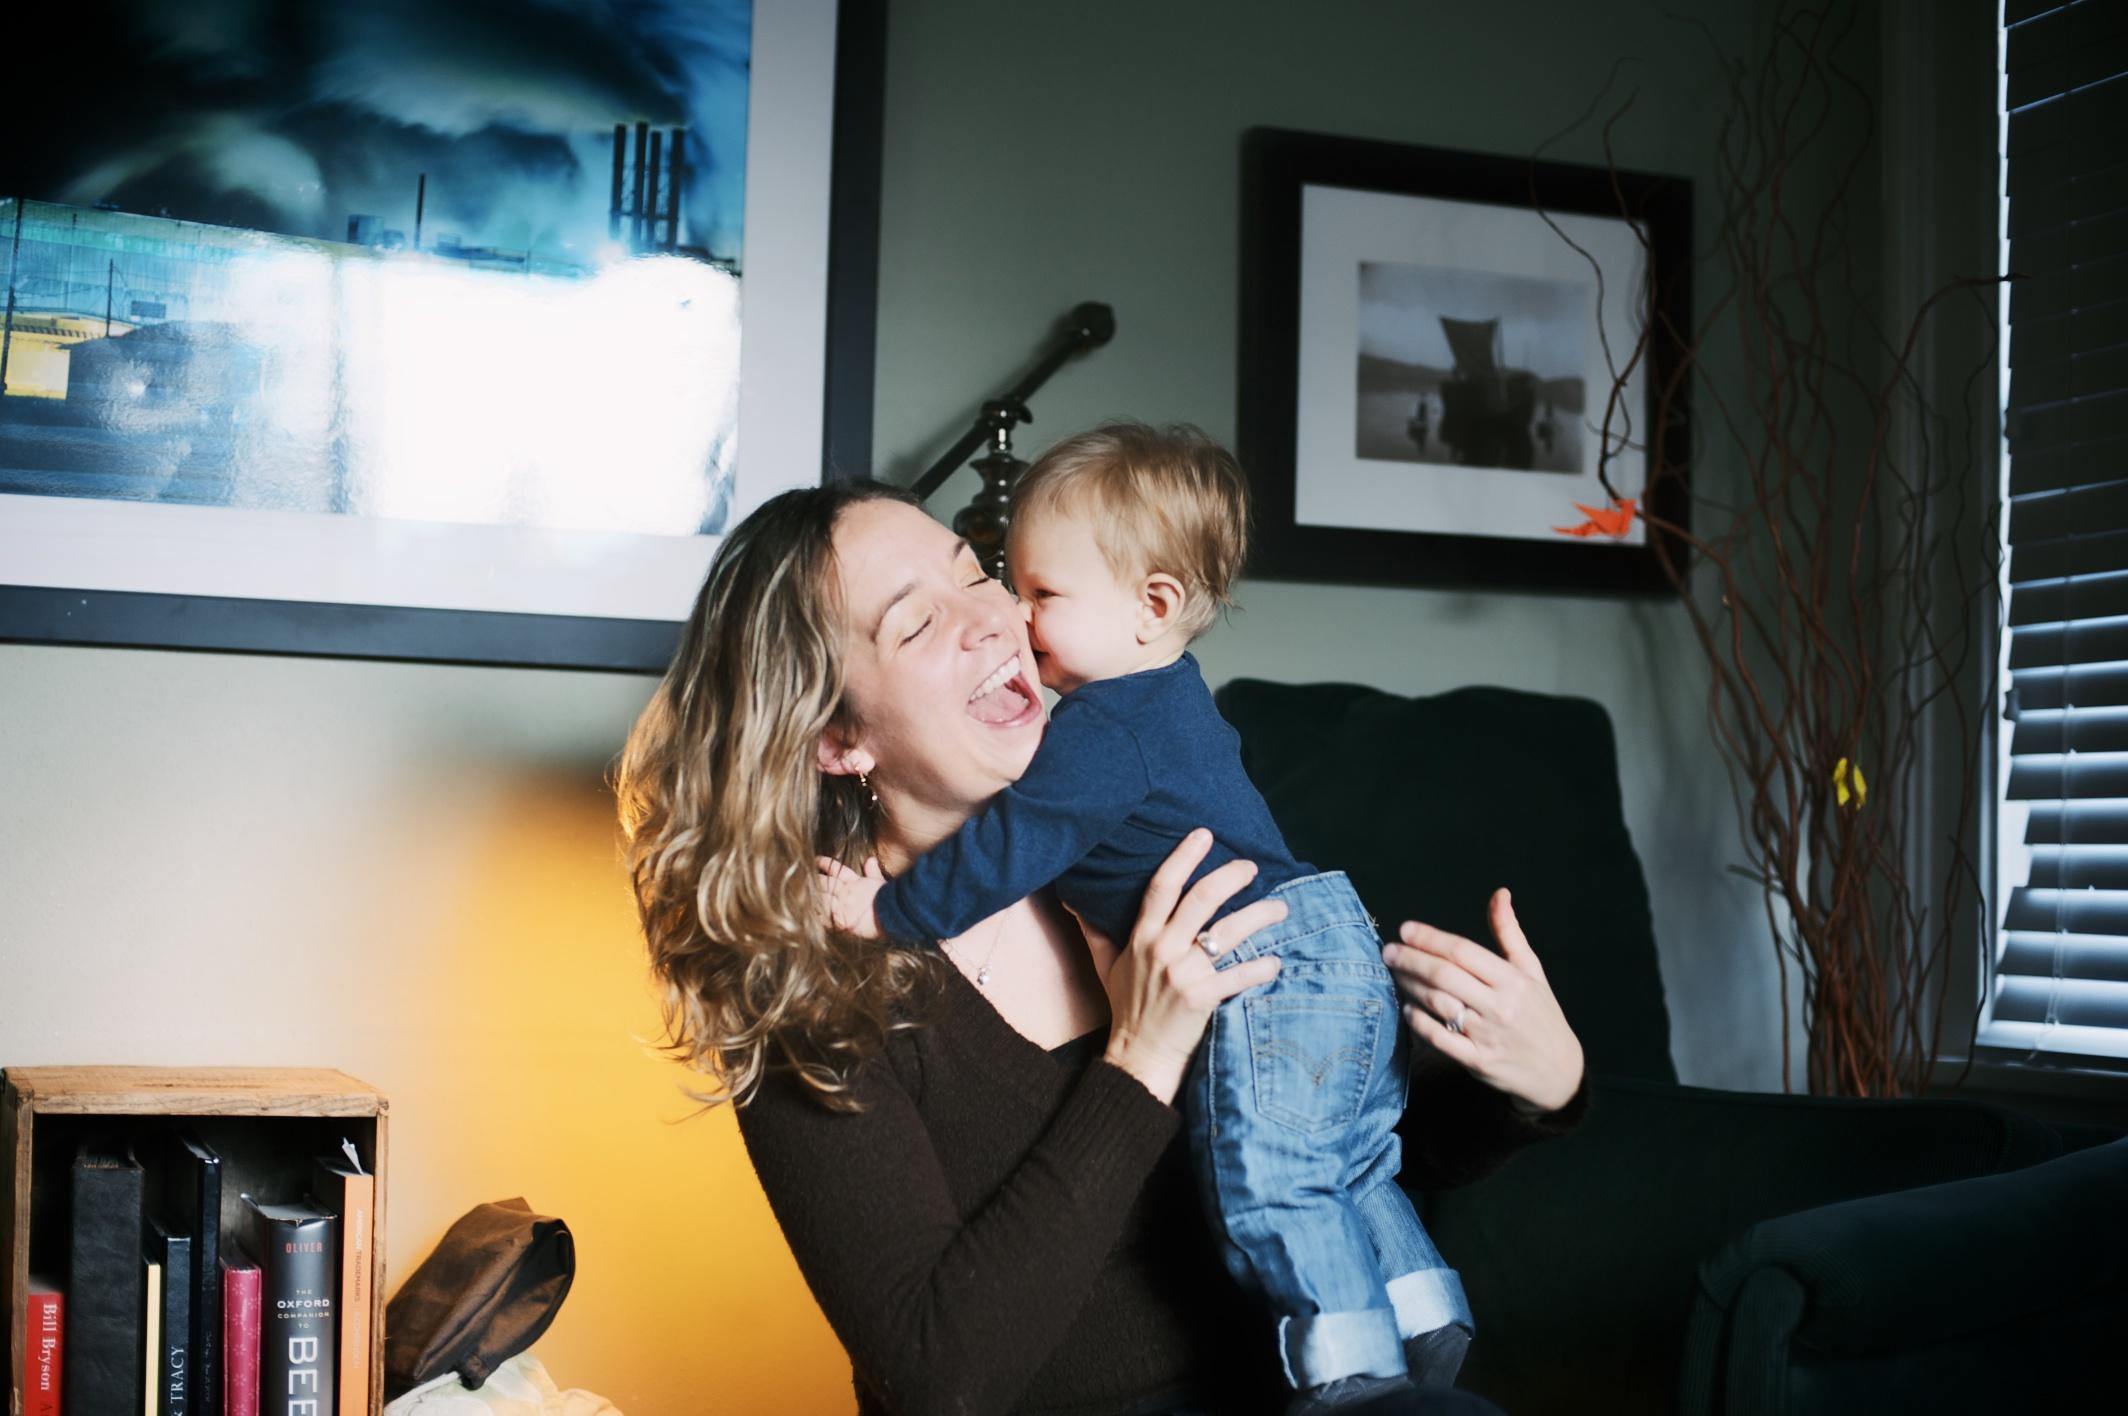 laurenlphotography(motherhood) 2 (1).jpg